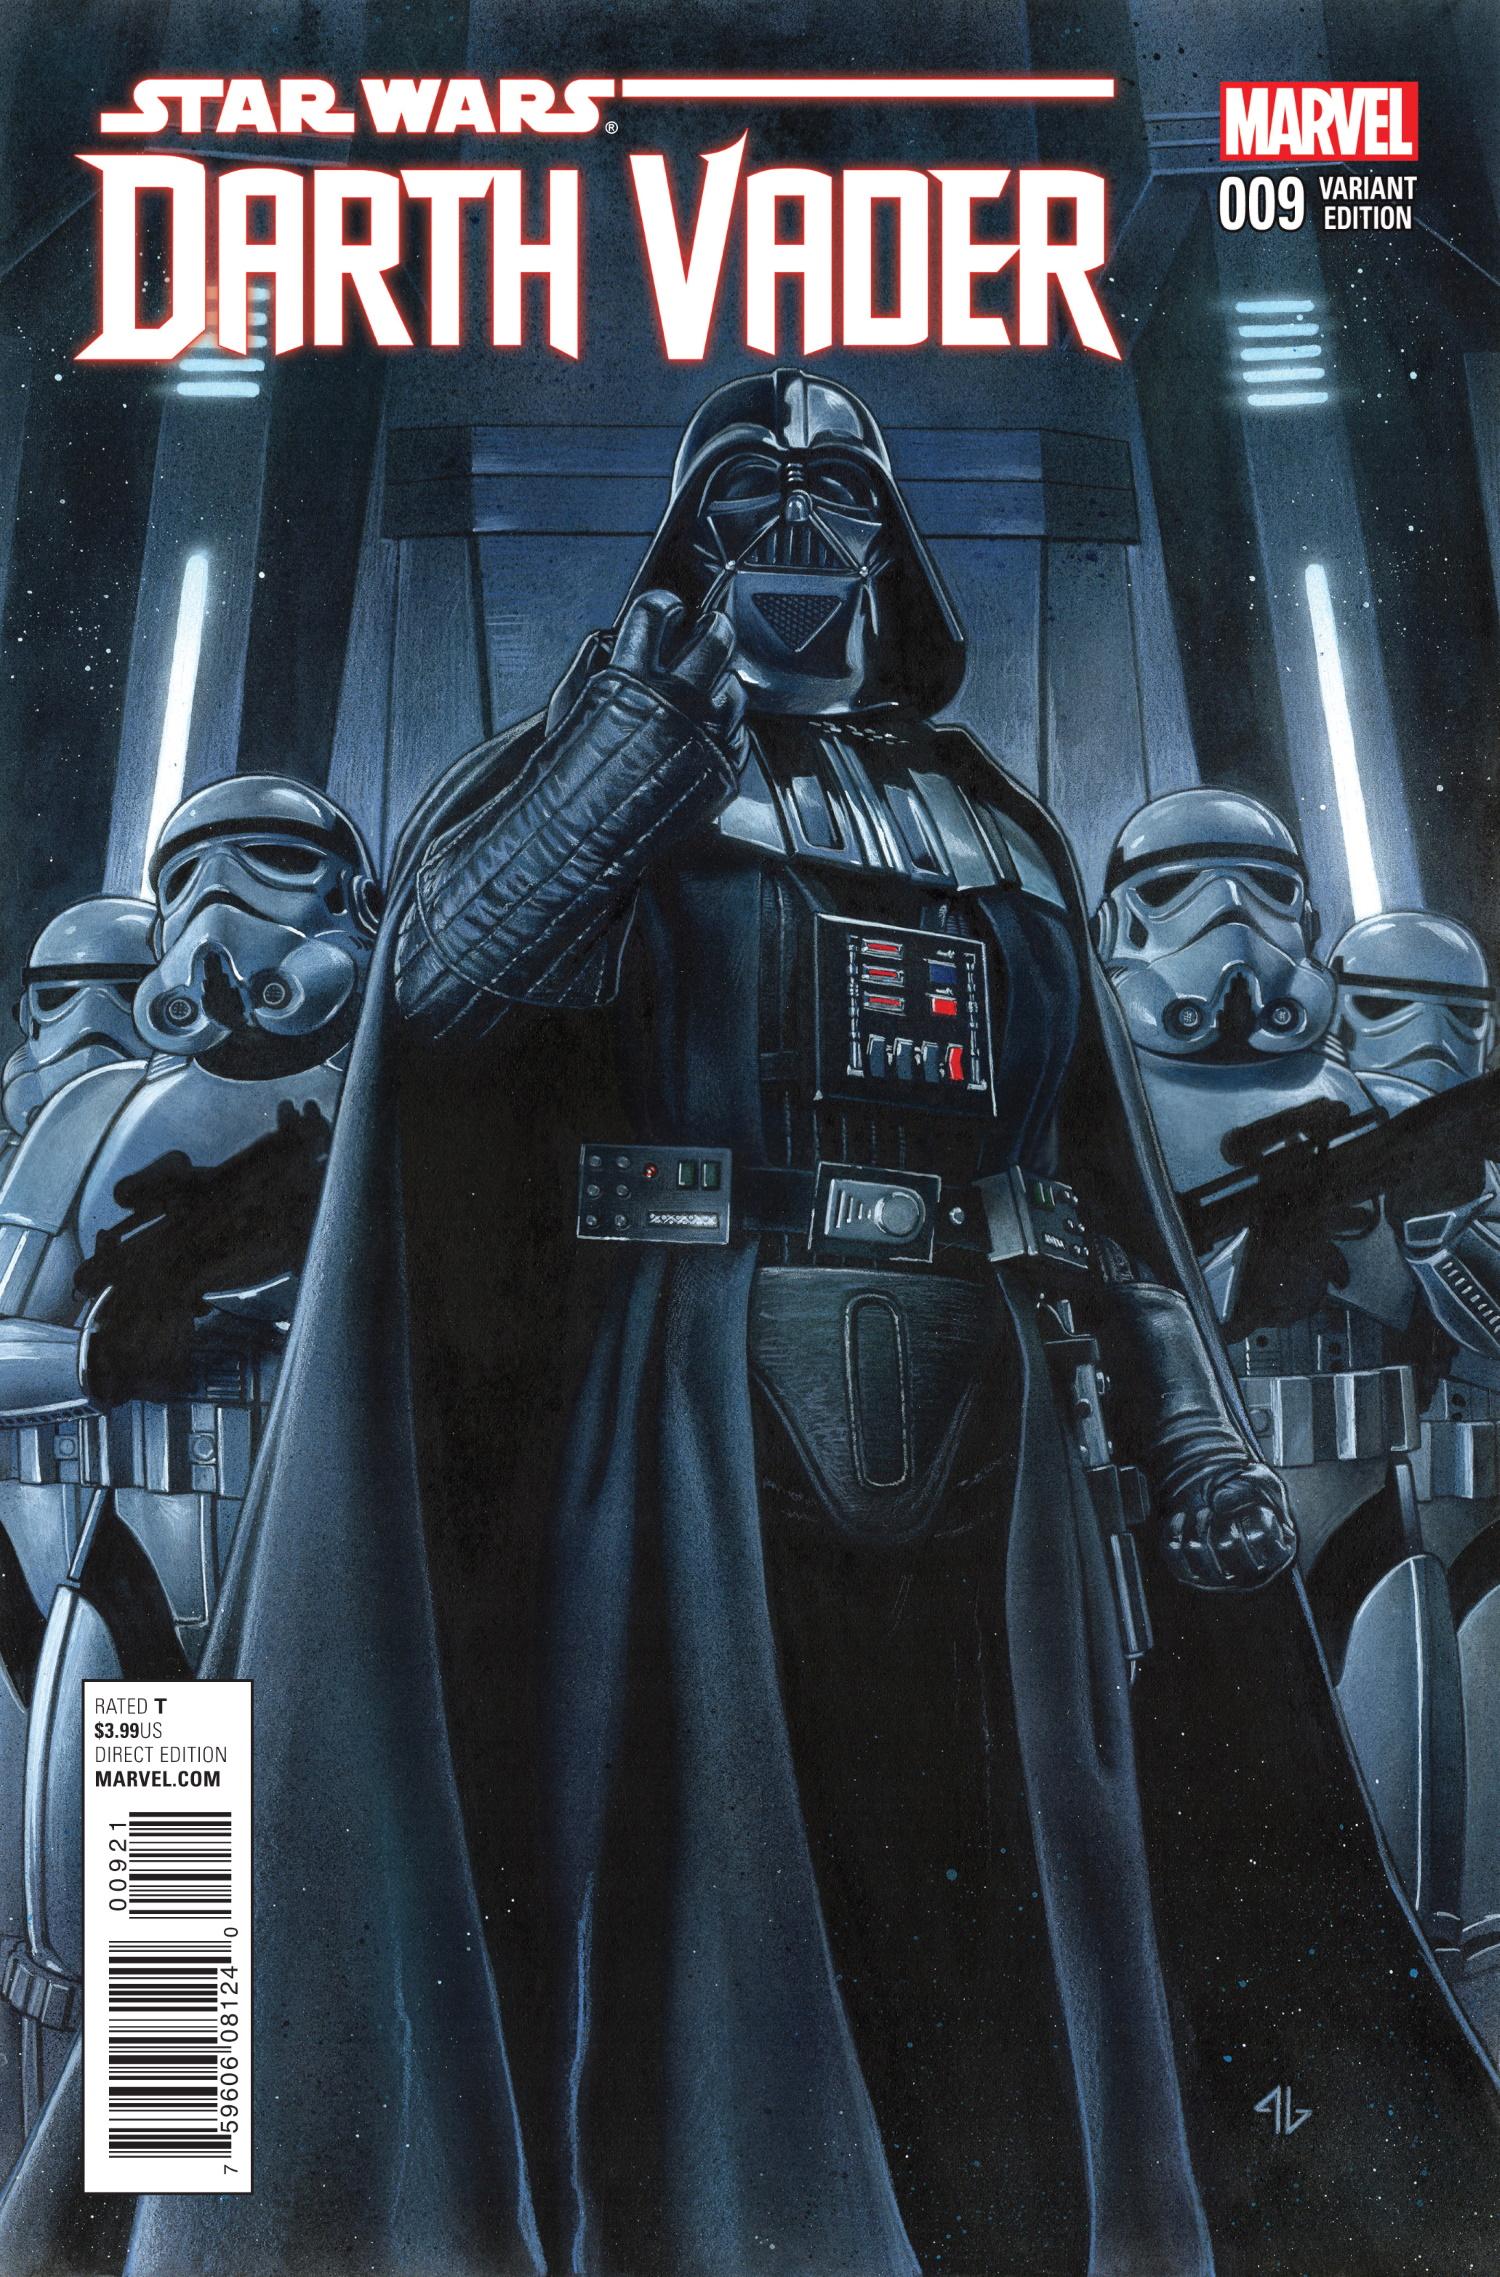 Darth Vader #9 (Adi Granov Variant Cover) (09.09.2015)